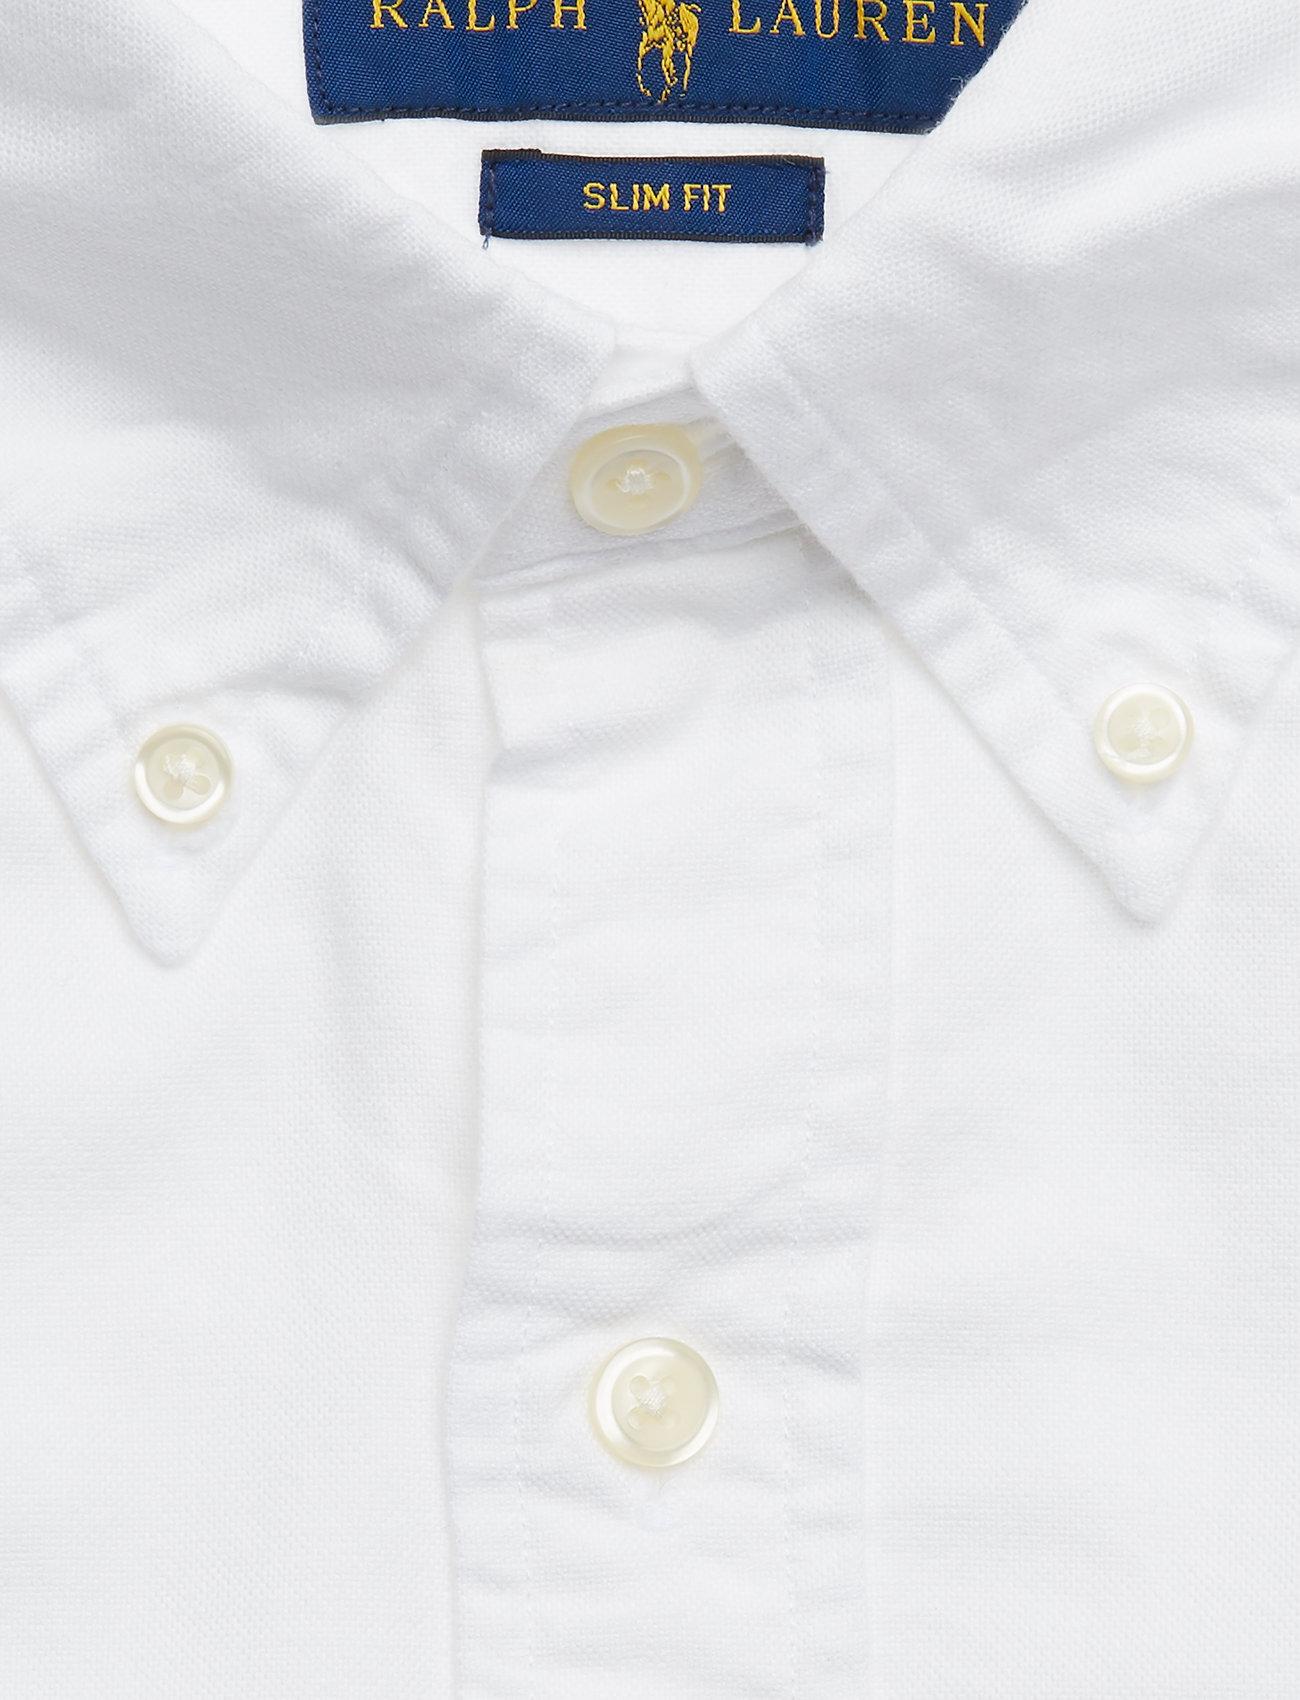 Slim Fit Oxford Shirt (White) (1195 kr) - Polo Ralph Lauren